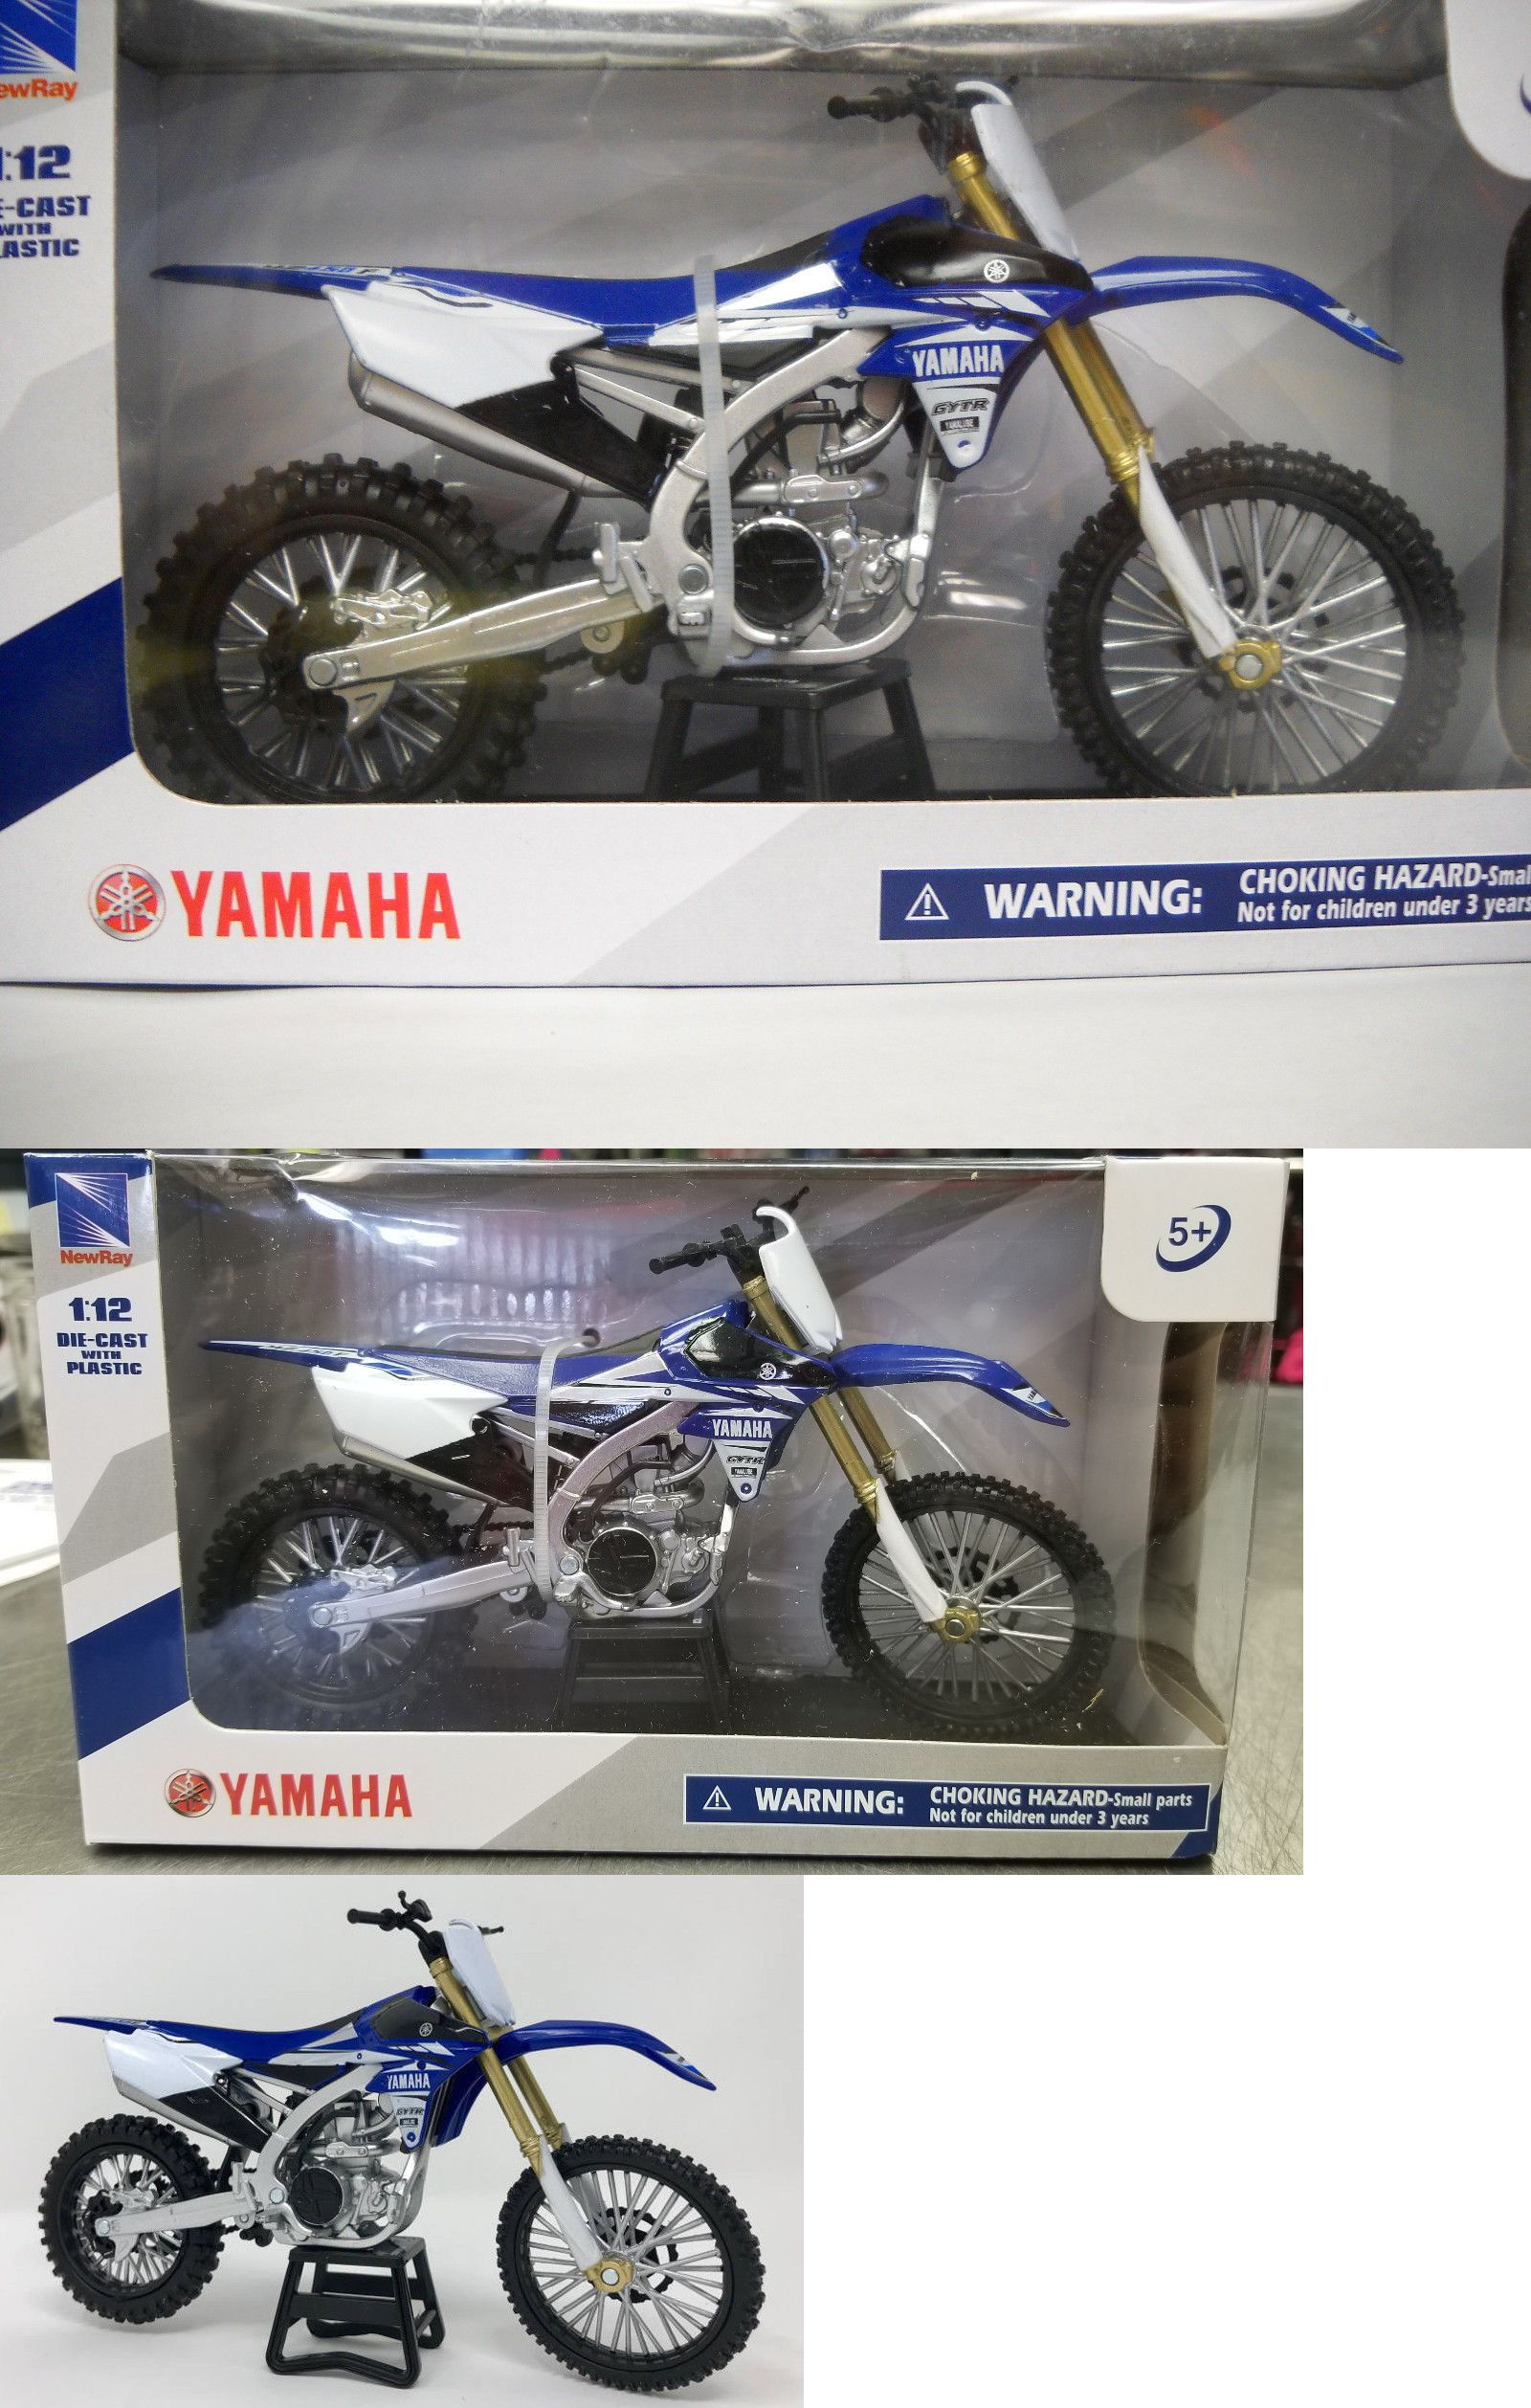 Motorcycles And Atvs 180276 Yamaha Yz450f 2017 1 12 Motorcycle